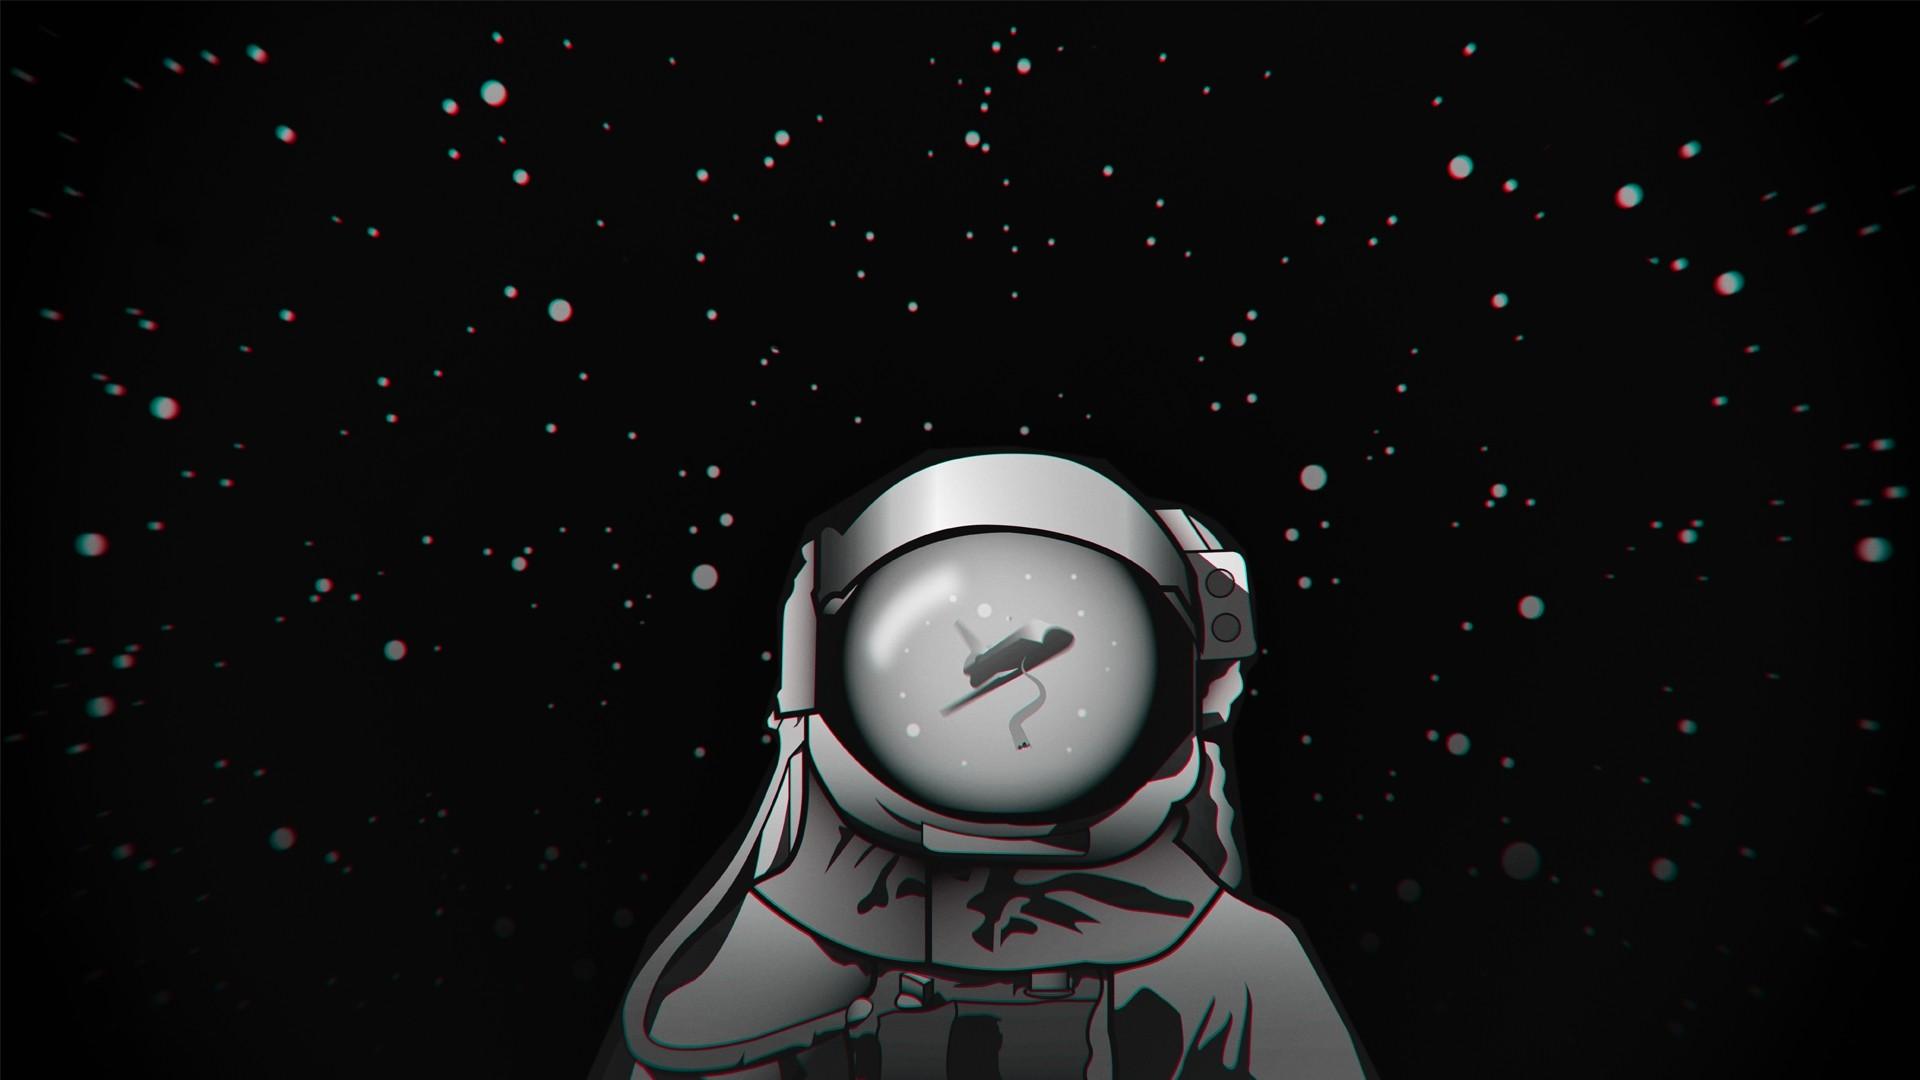 Astronaut Pic